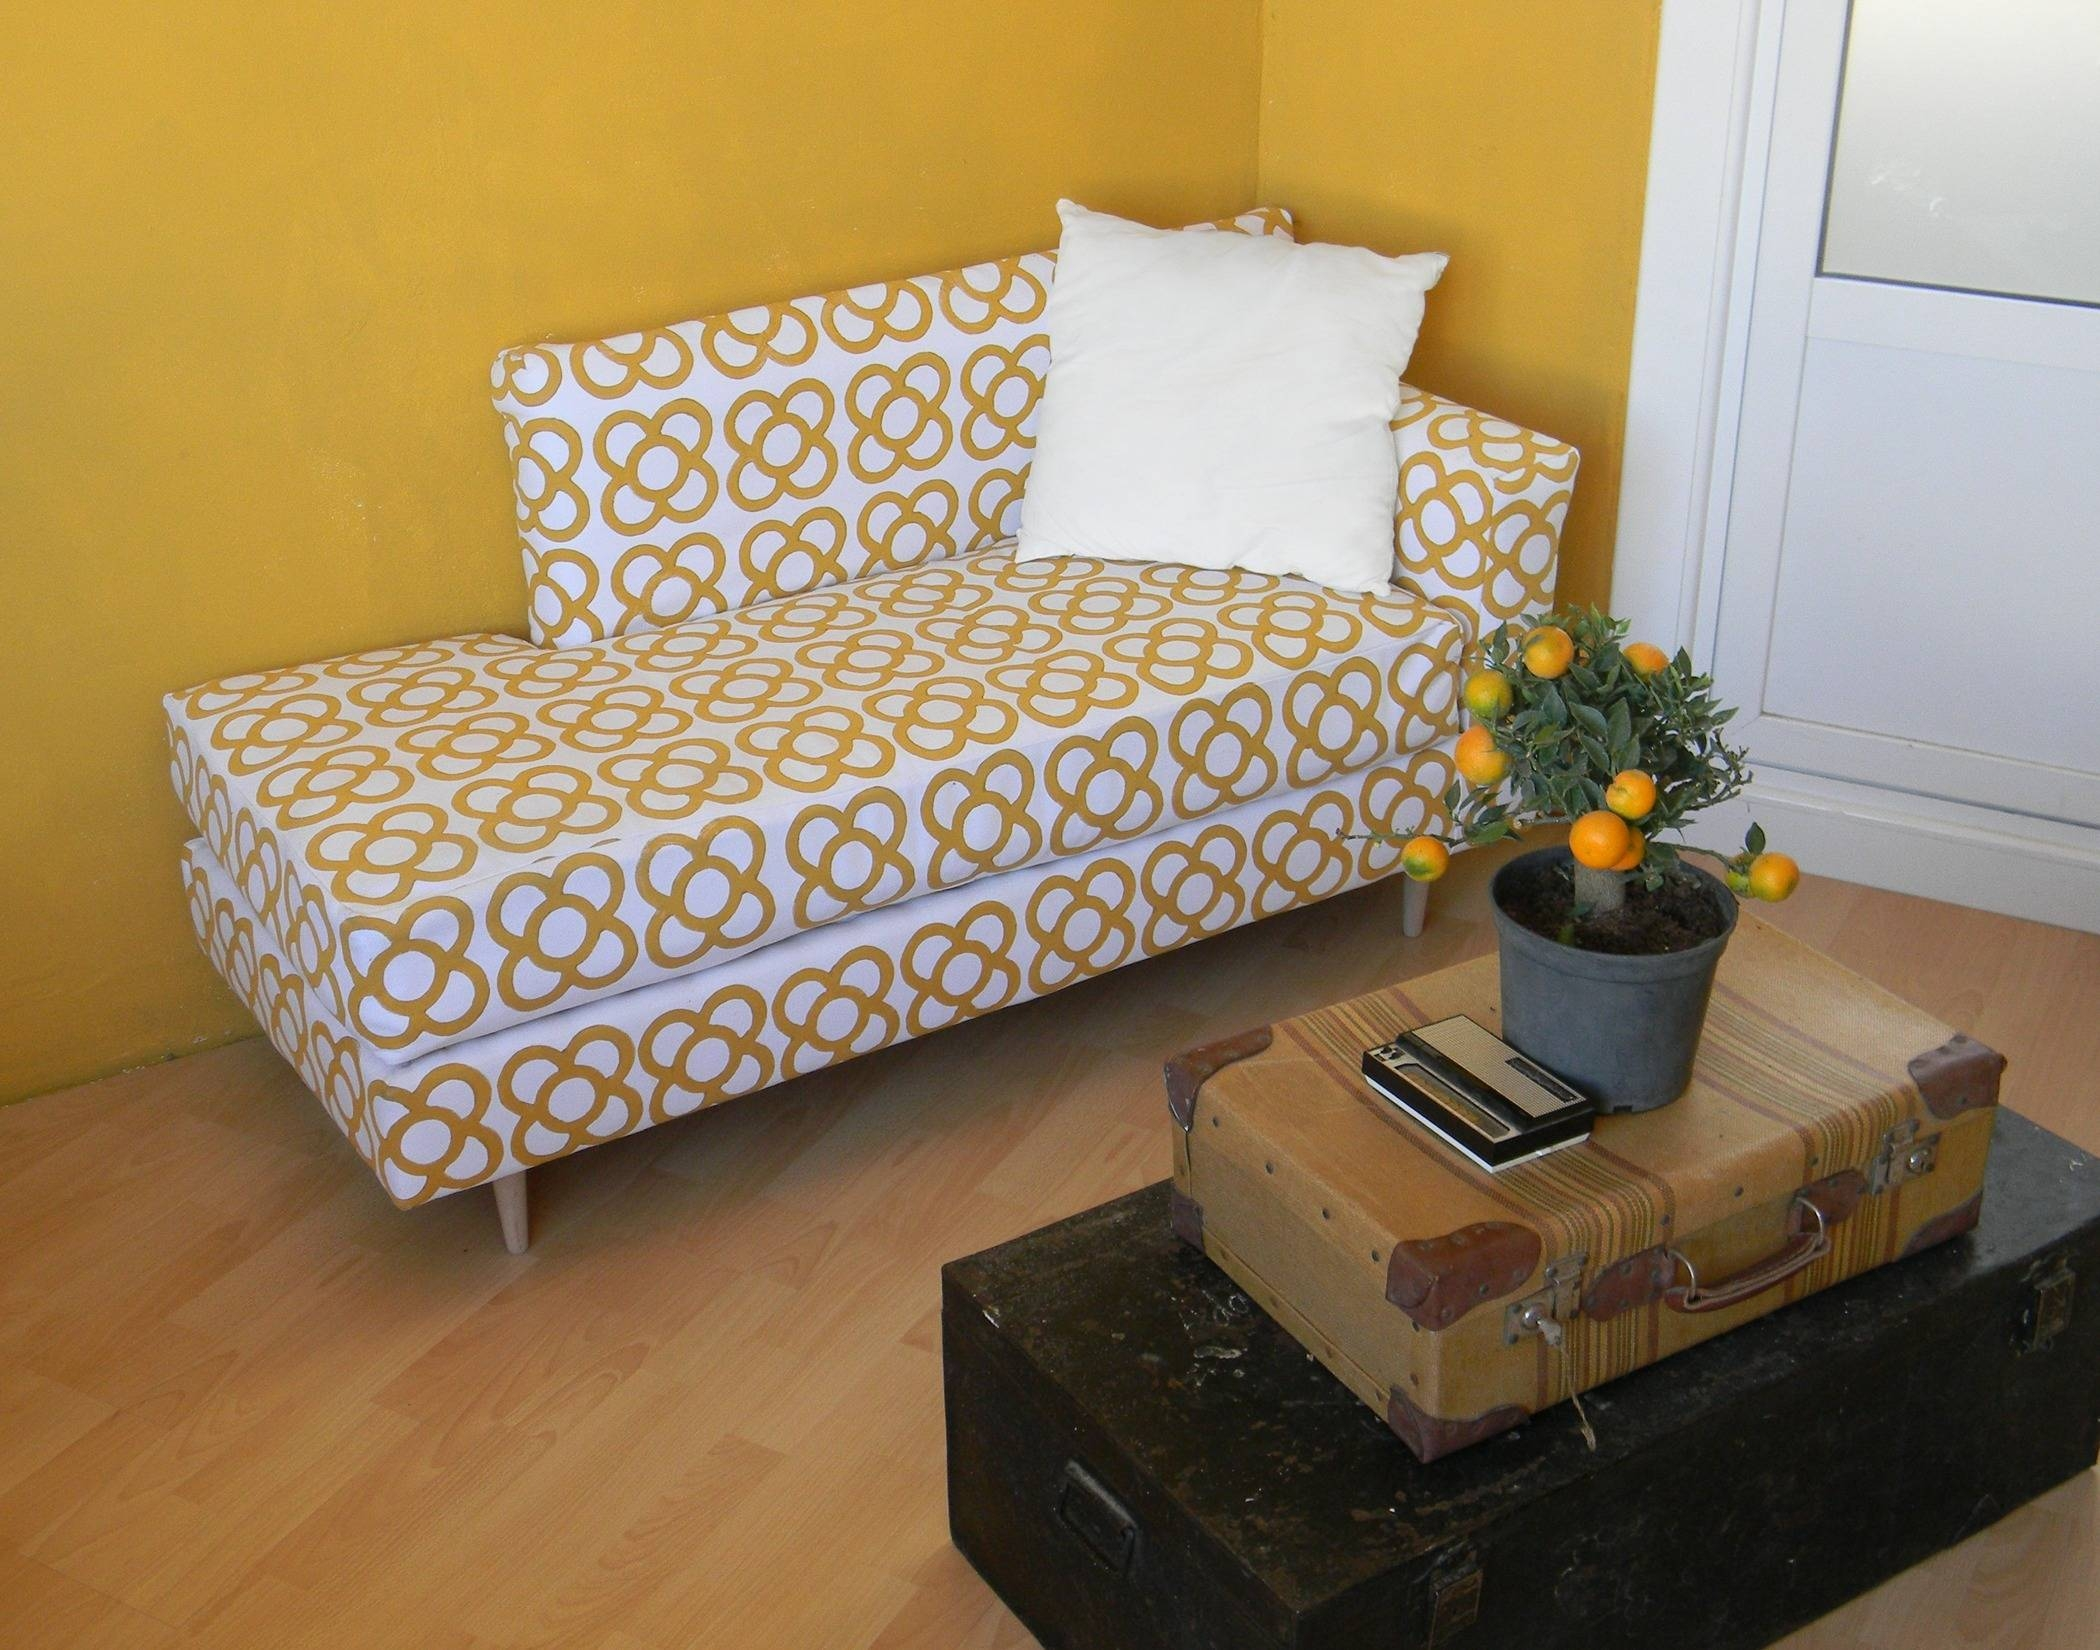 30 Best Ideas of Diy Sleeper Sofa